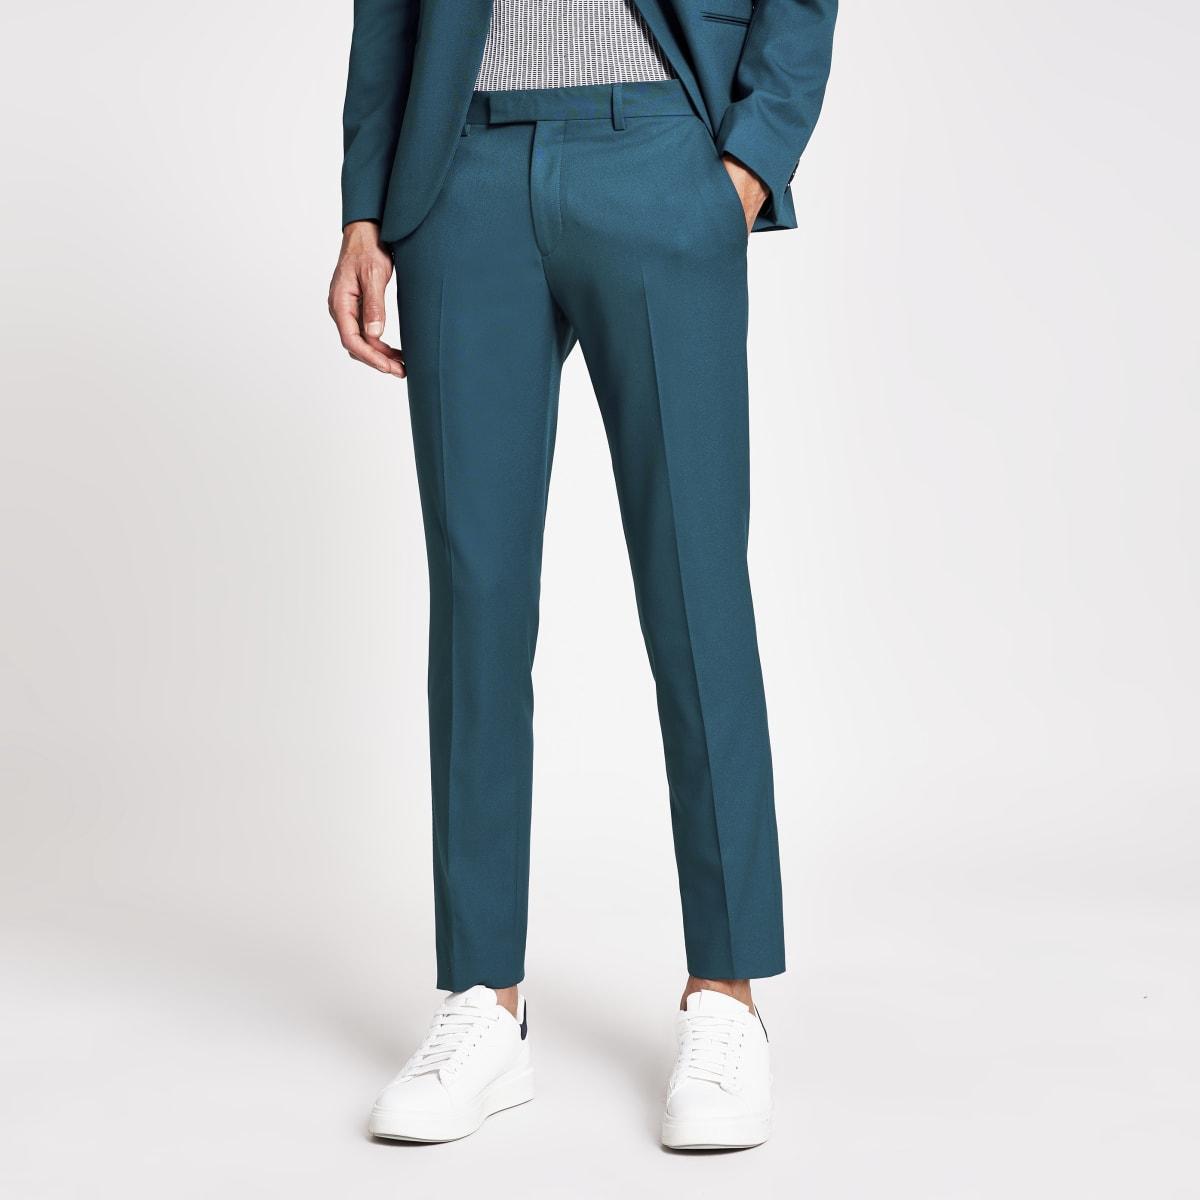 Groenblauwe skinny-fit stretch pantalon